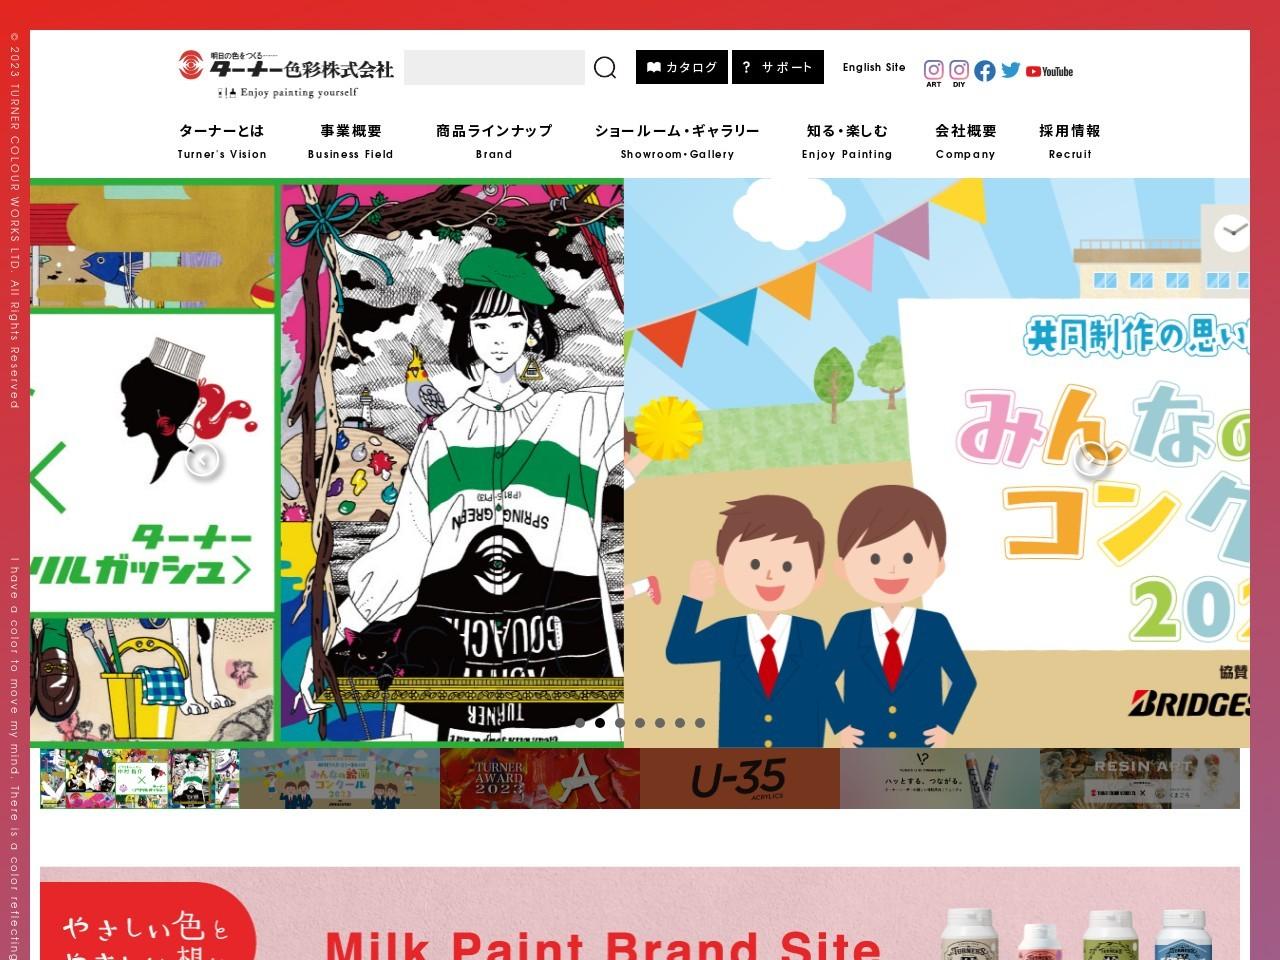 http://turner.co.jp/paint/ironpaint/